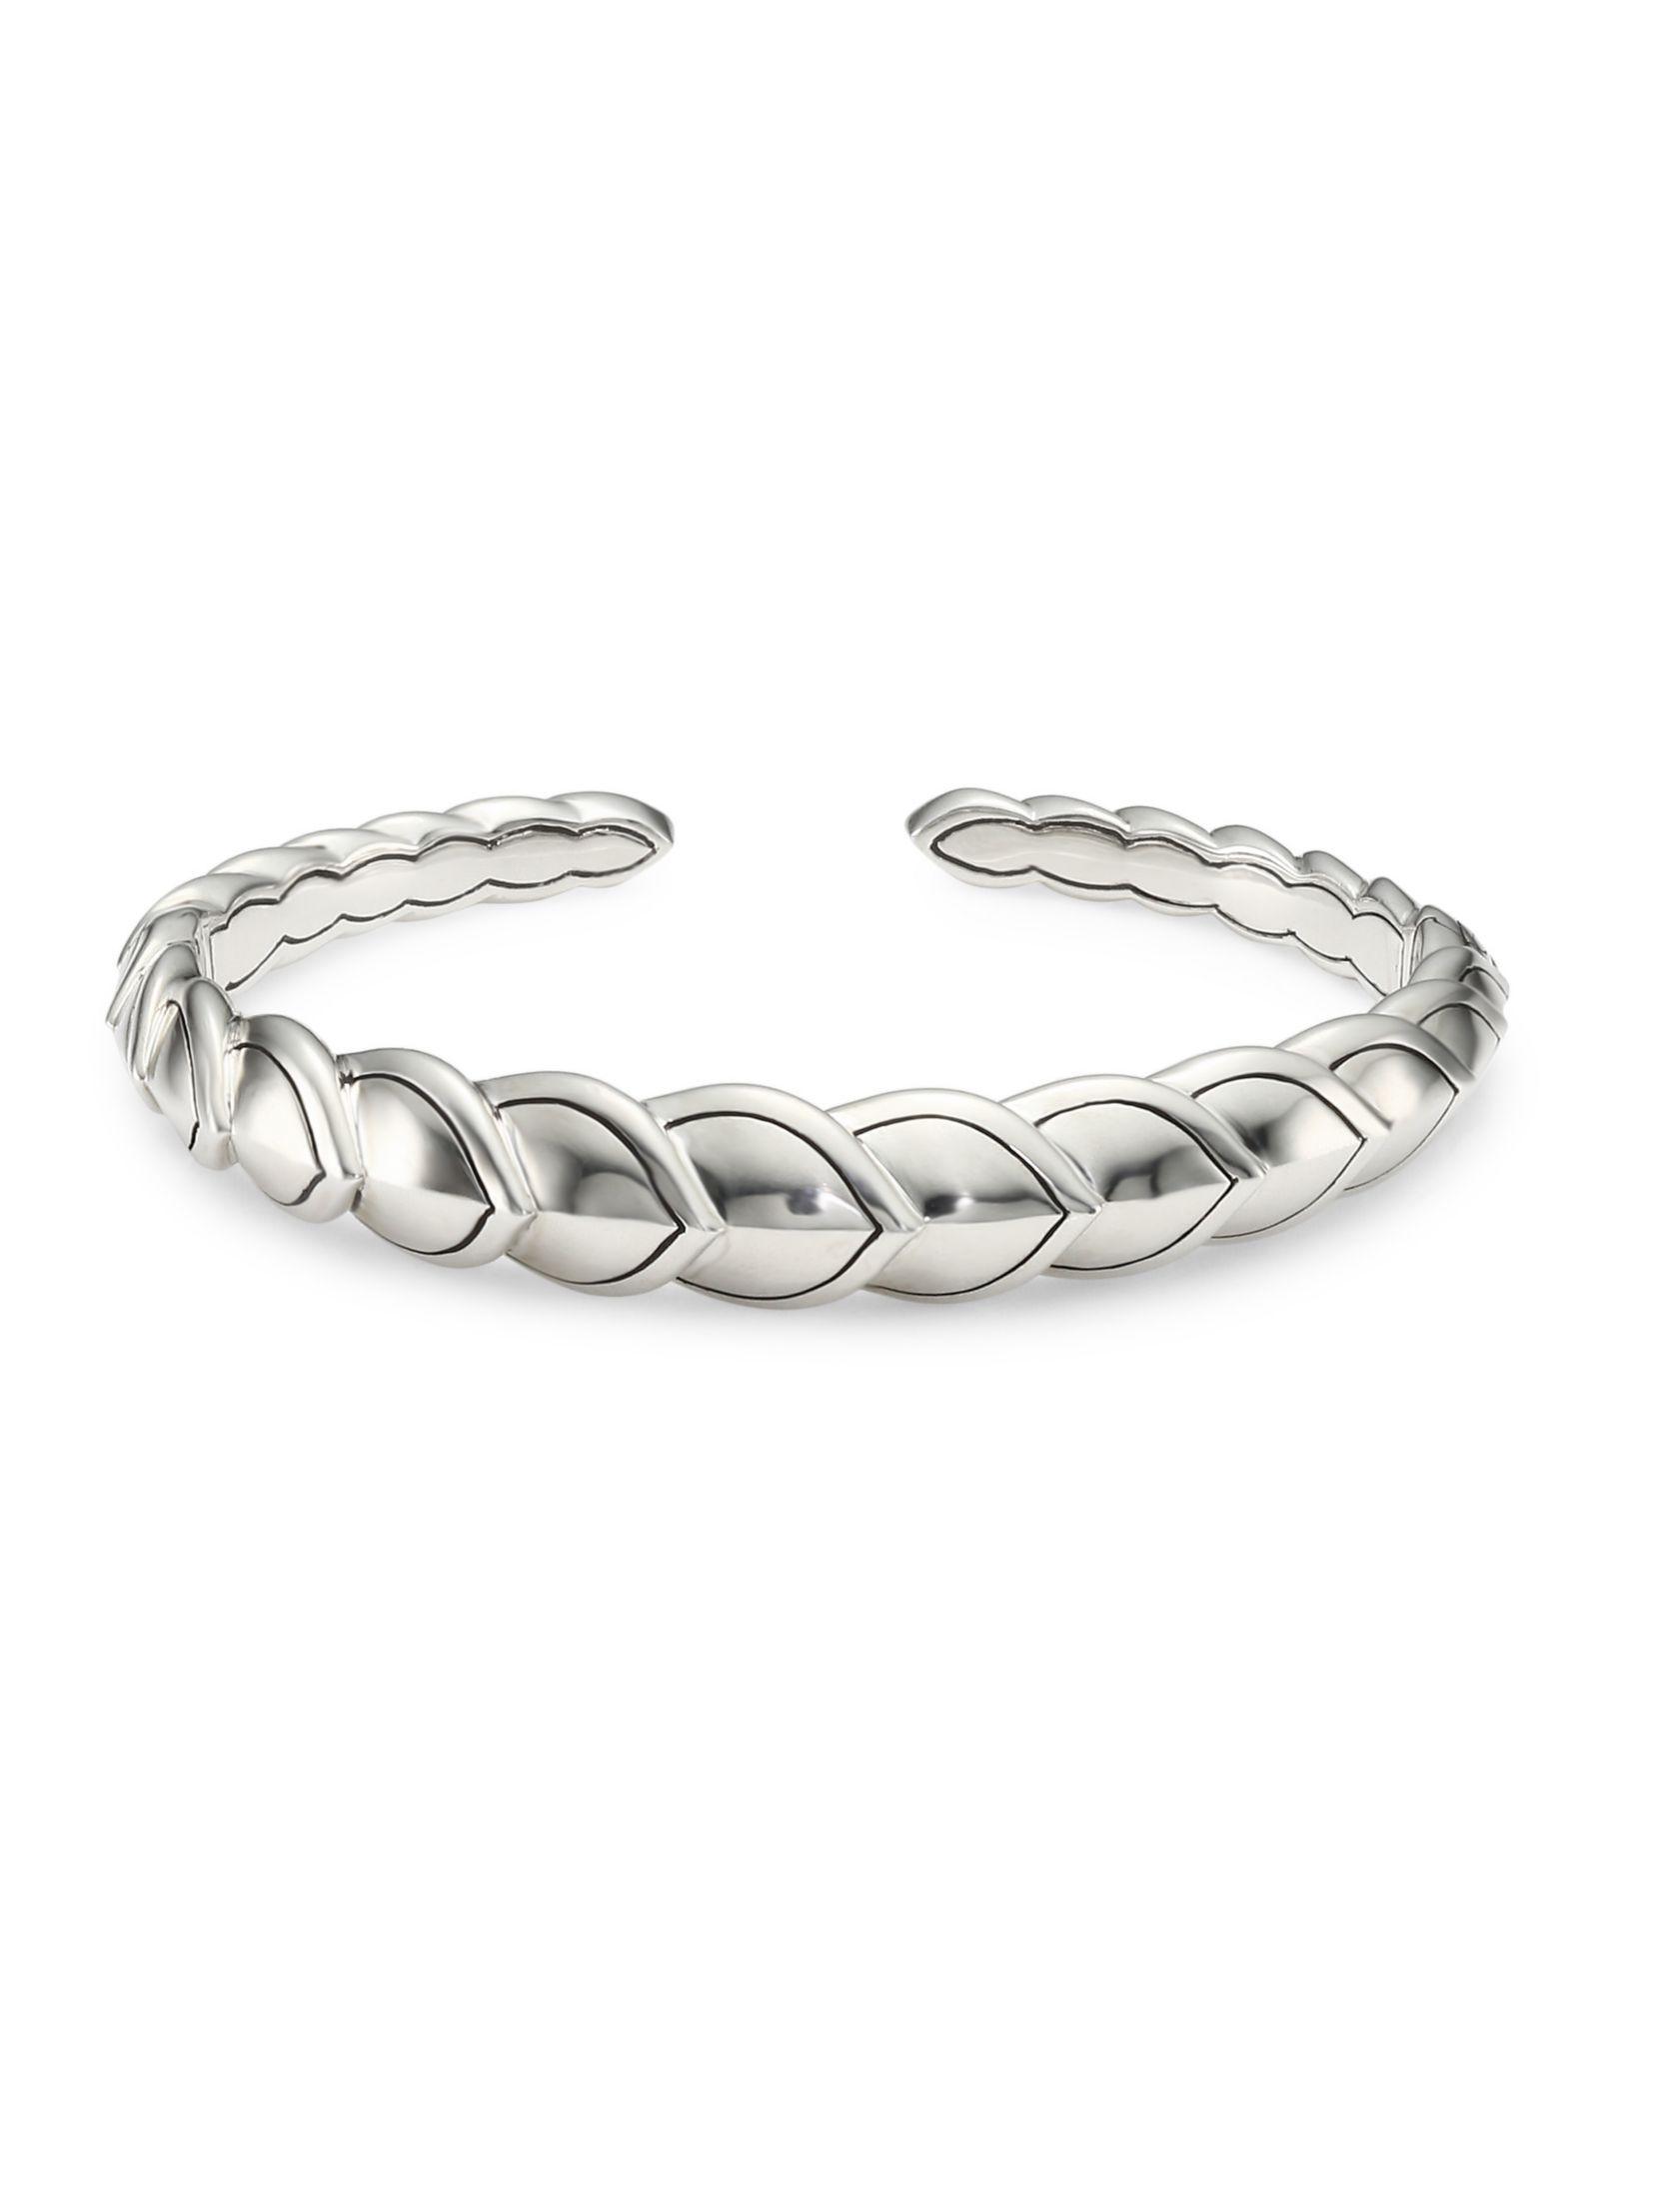 John hardy legends naga silver small flex cuff accessories pinterest